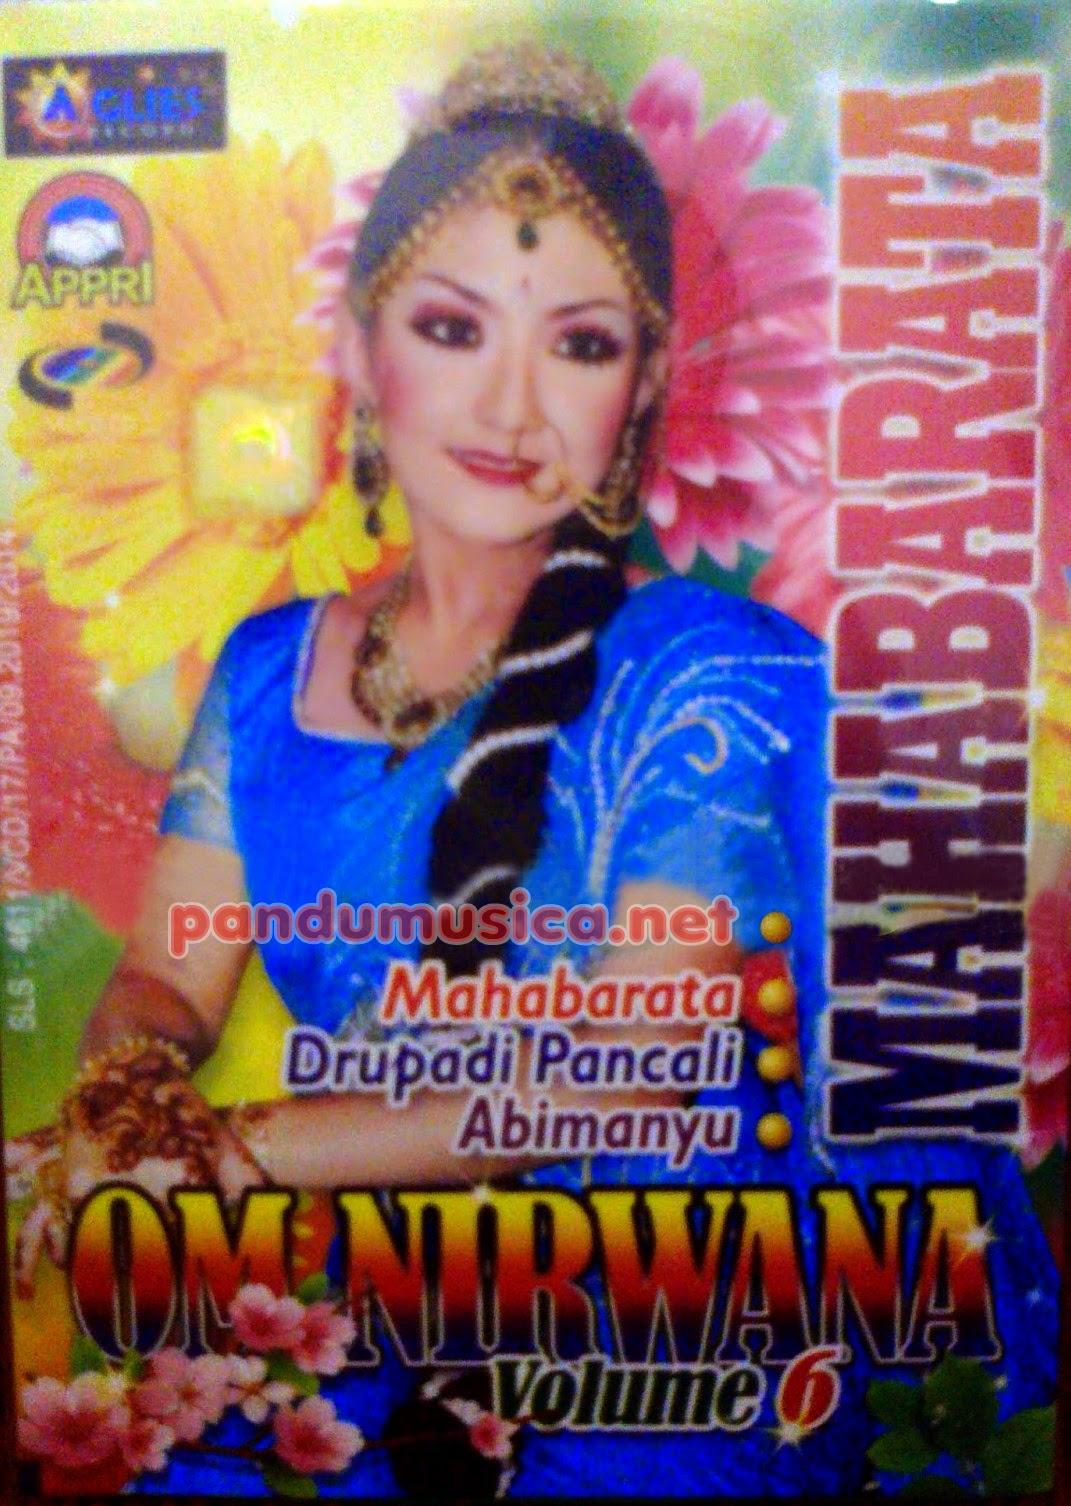 Download Lagu Luka Hati Luka Diri – Ayu Oktavia – OM Nirwana Vol 6 Mahabarata 2014